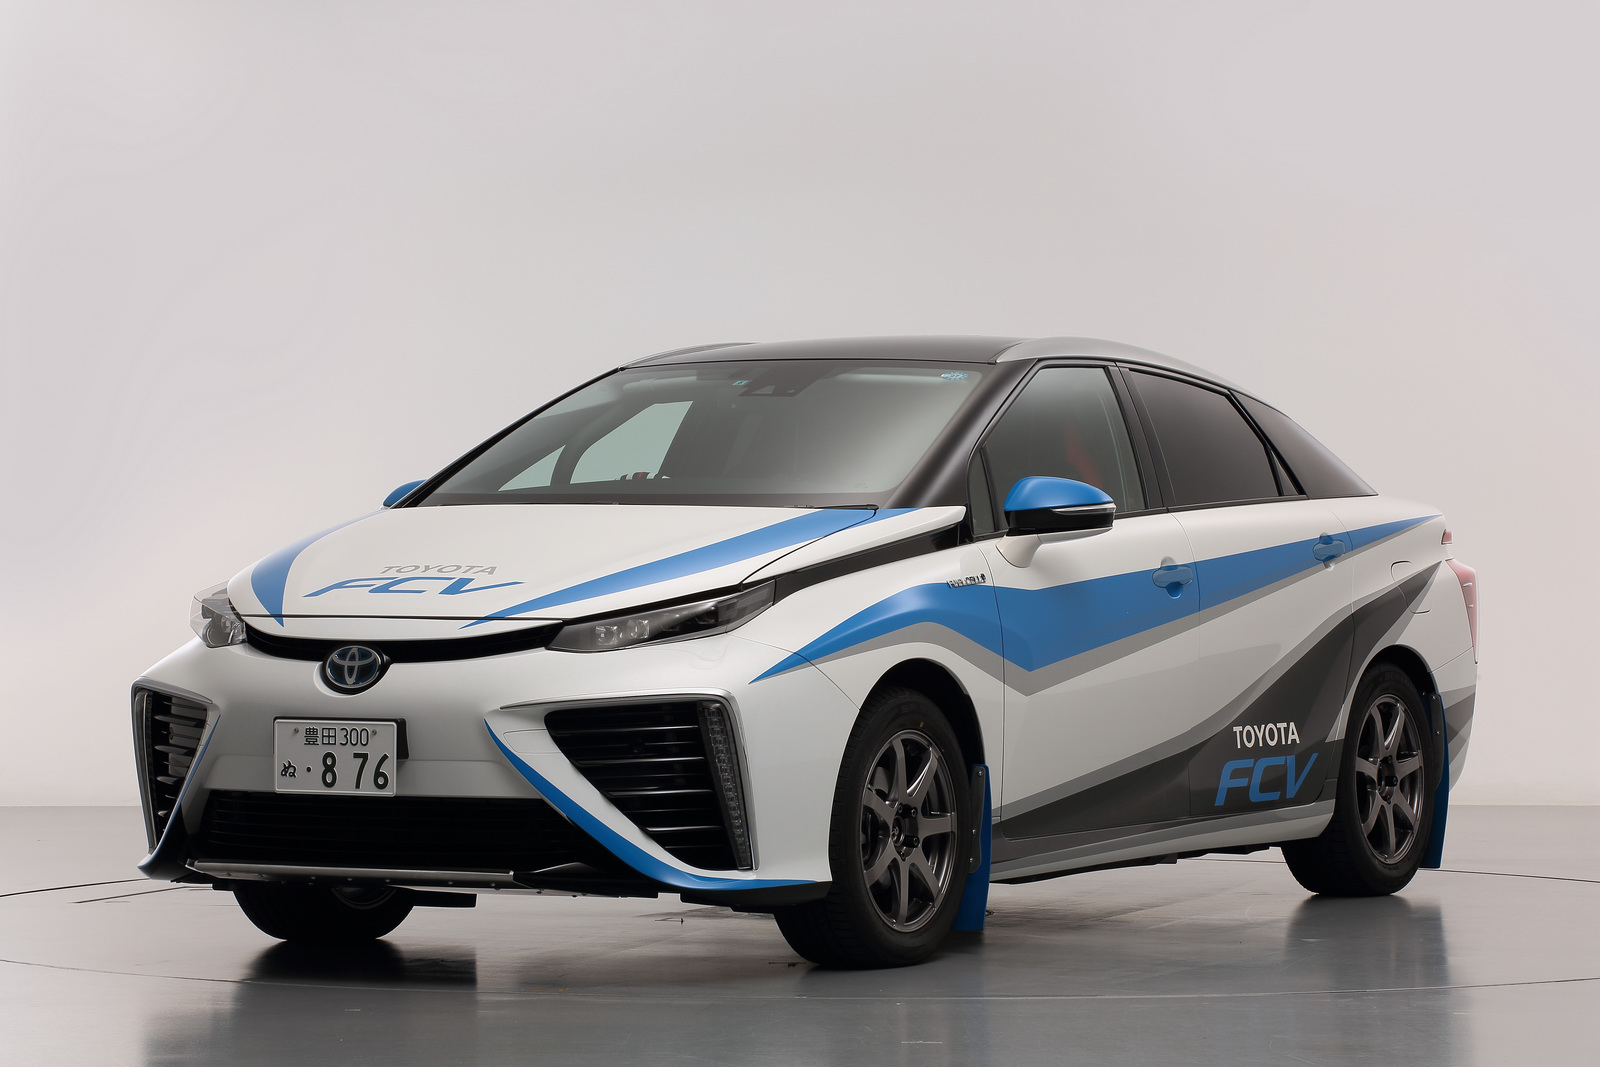 Toyota FCV Backgrounds on Wallpapers Vista